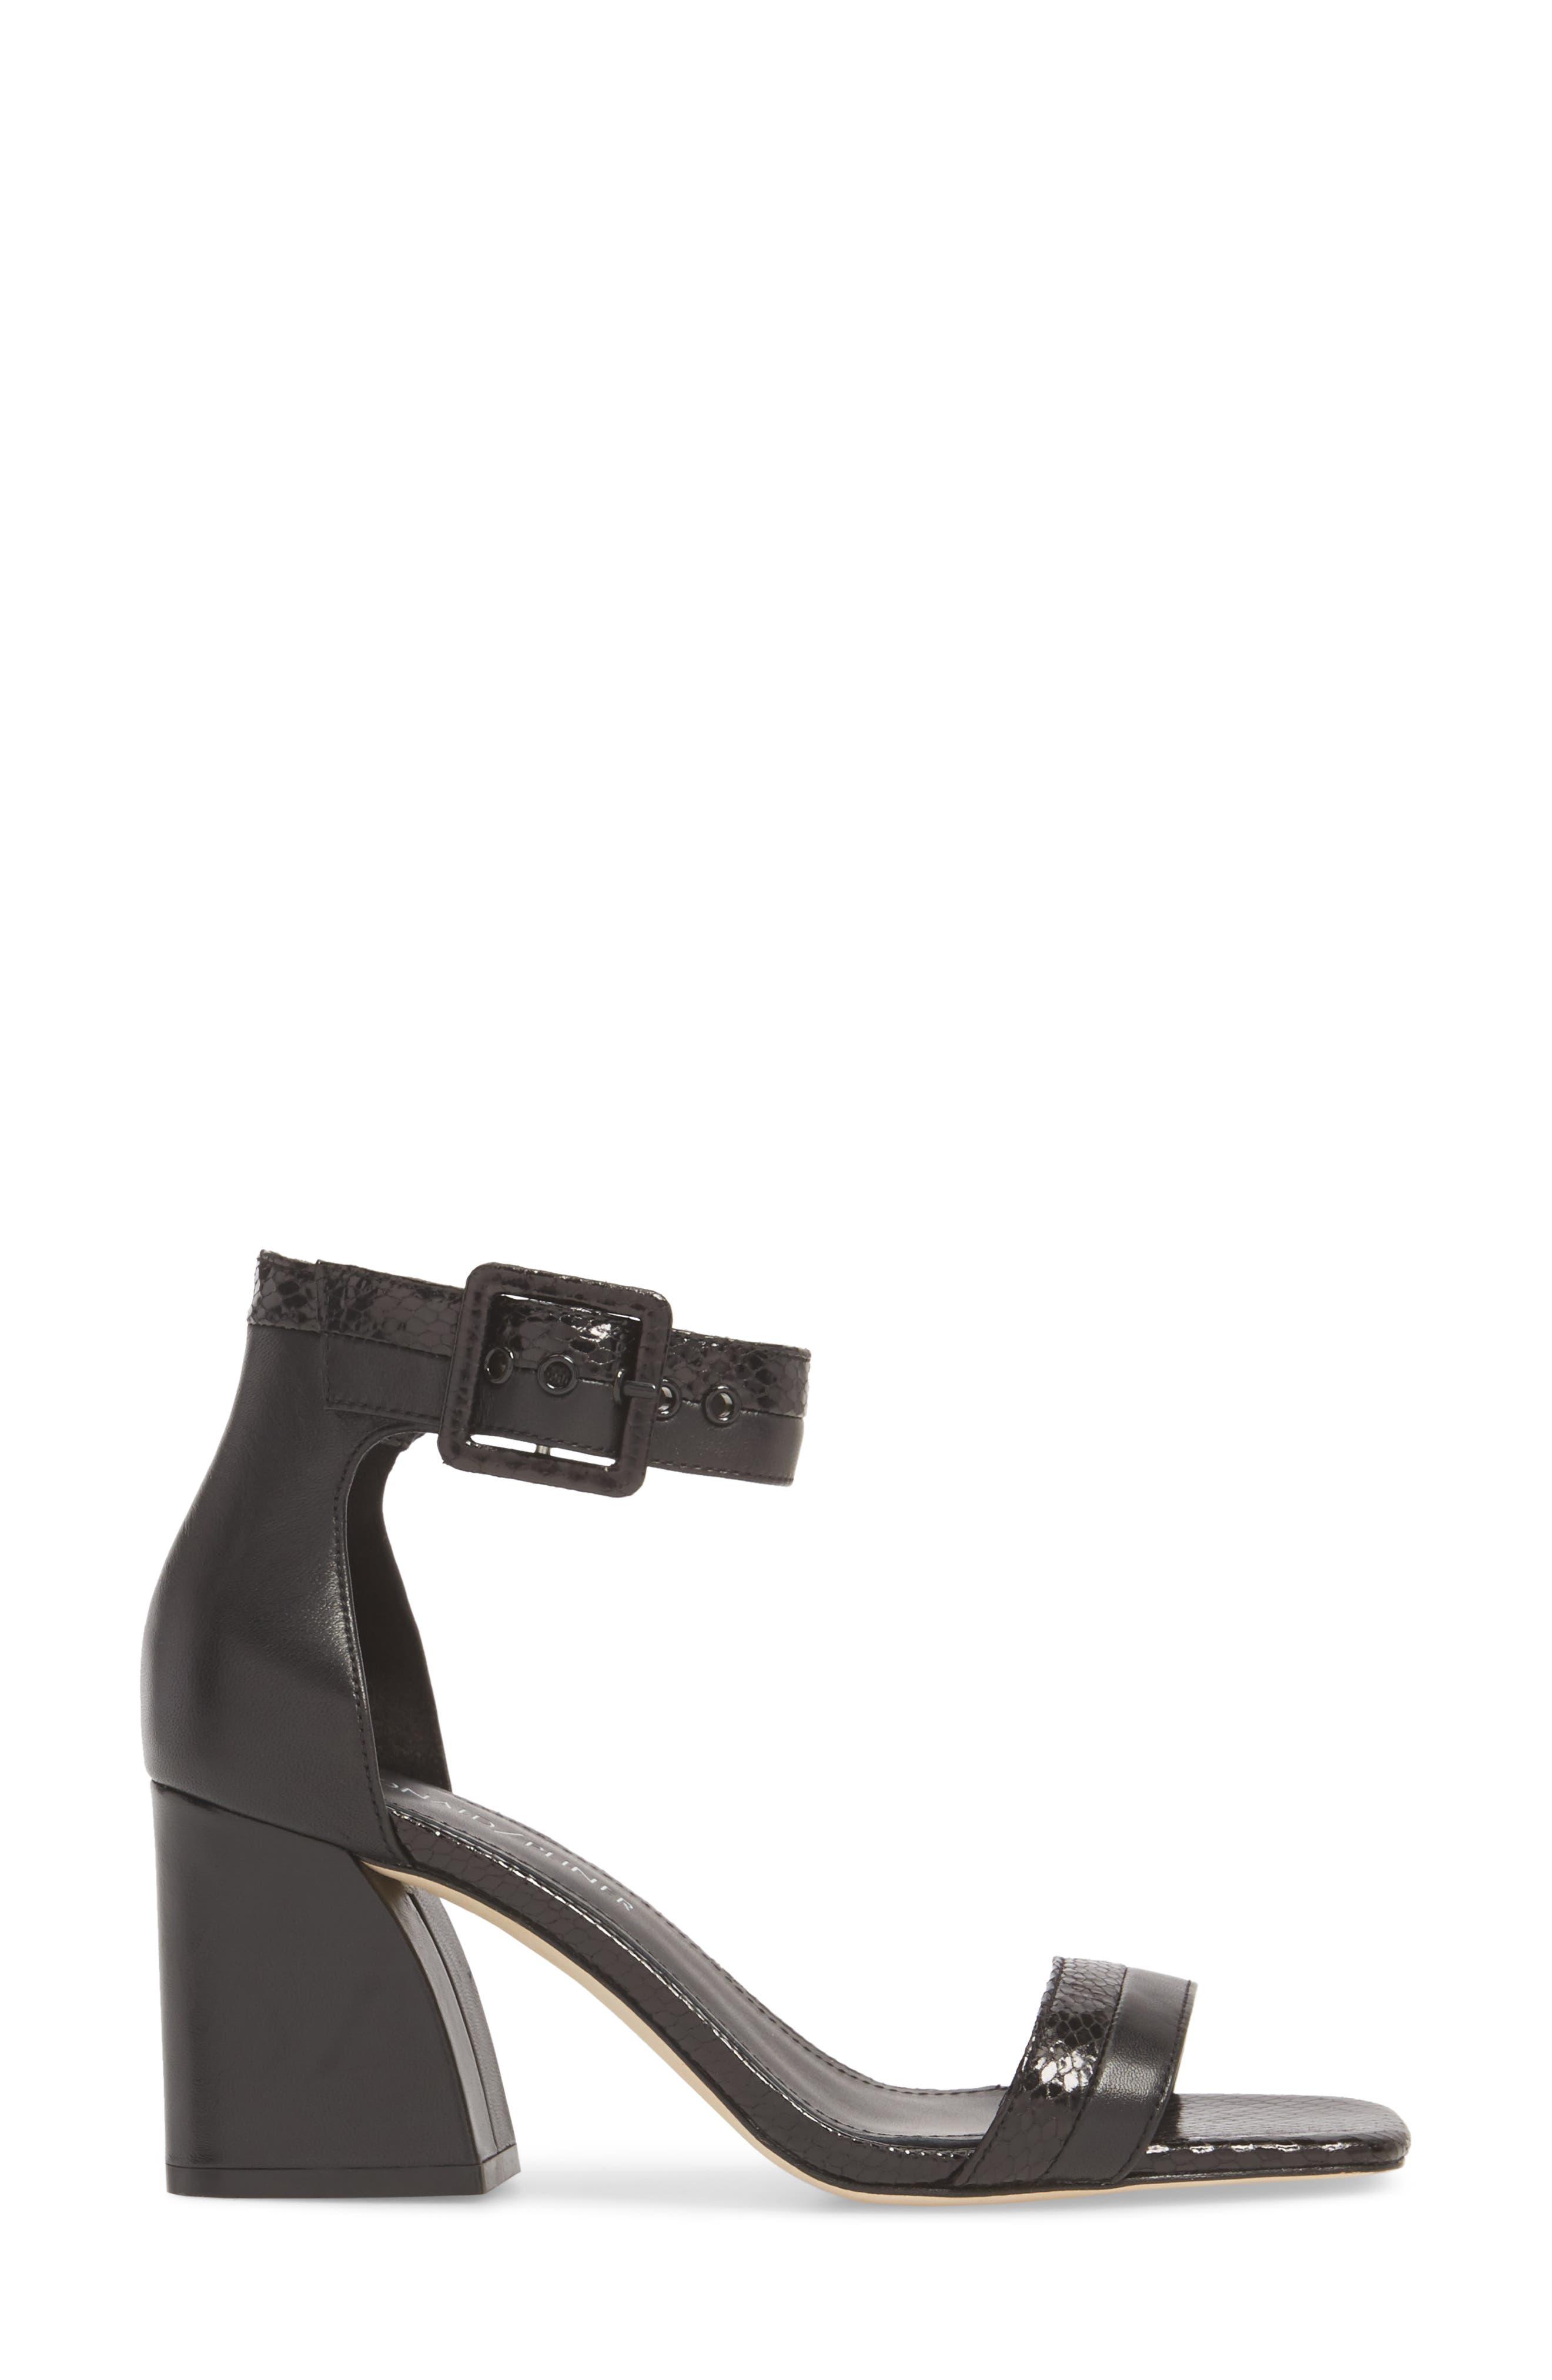 Watson Ankle Strap Sandal,                             Alternate thumbnail 3, color,                             BLACK PRINTED LEATHER